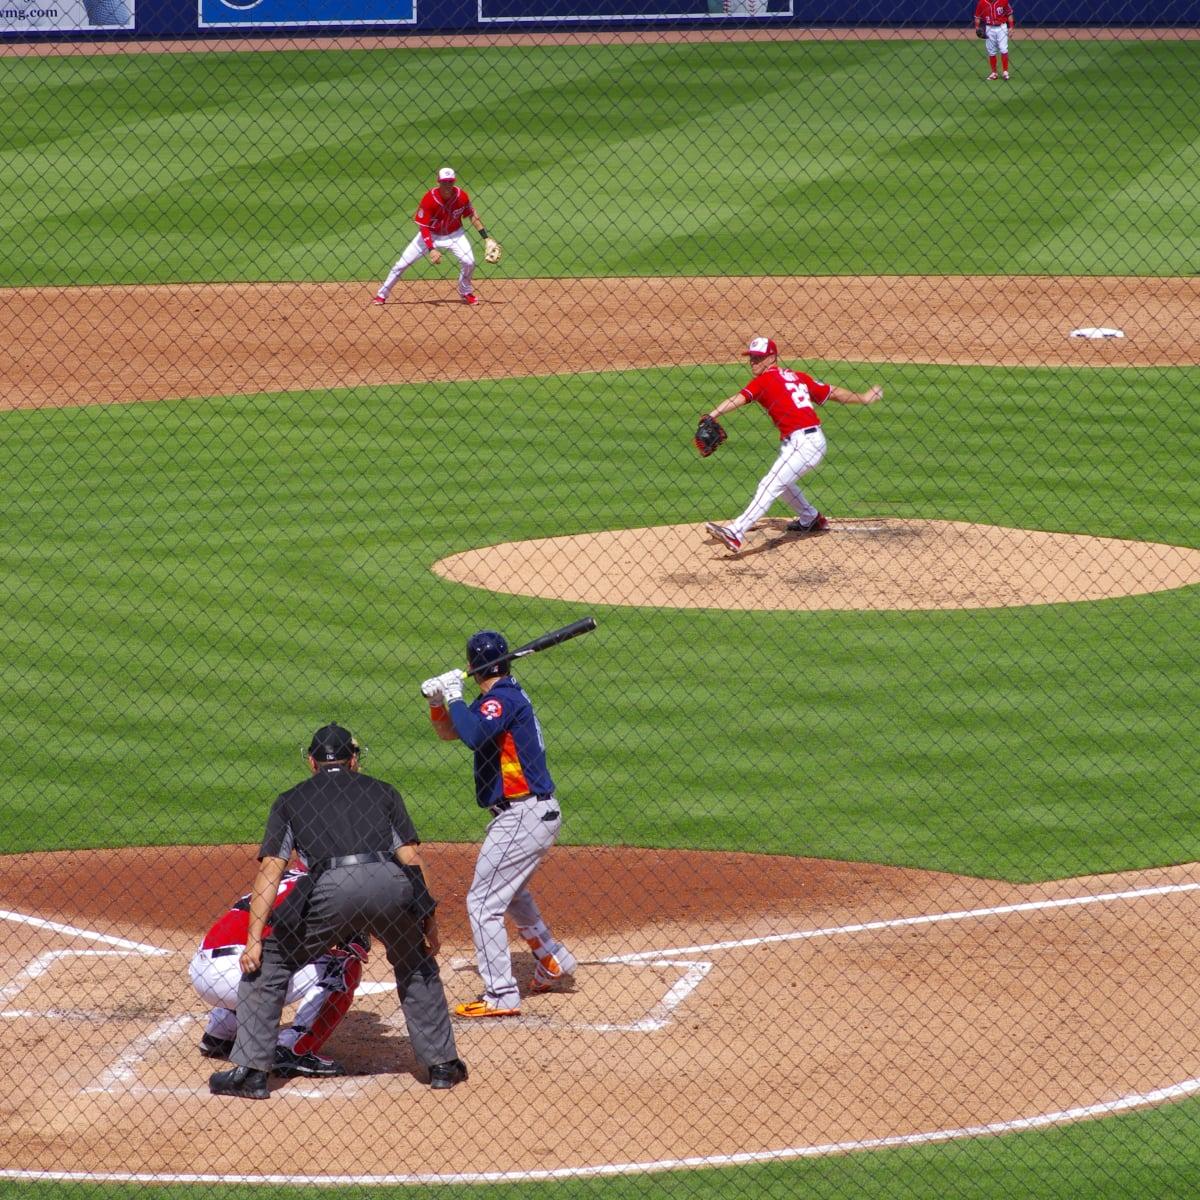 Diamond days: West Palm Beach wows with Astros Spring Training ...